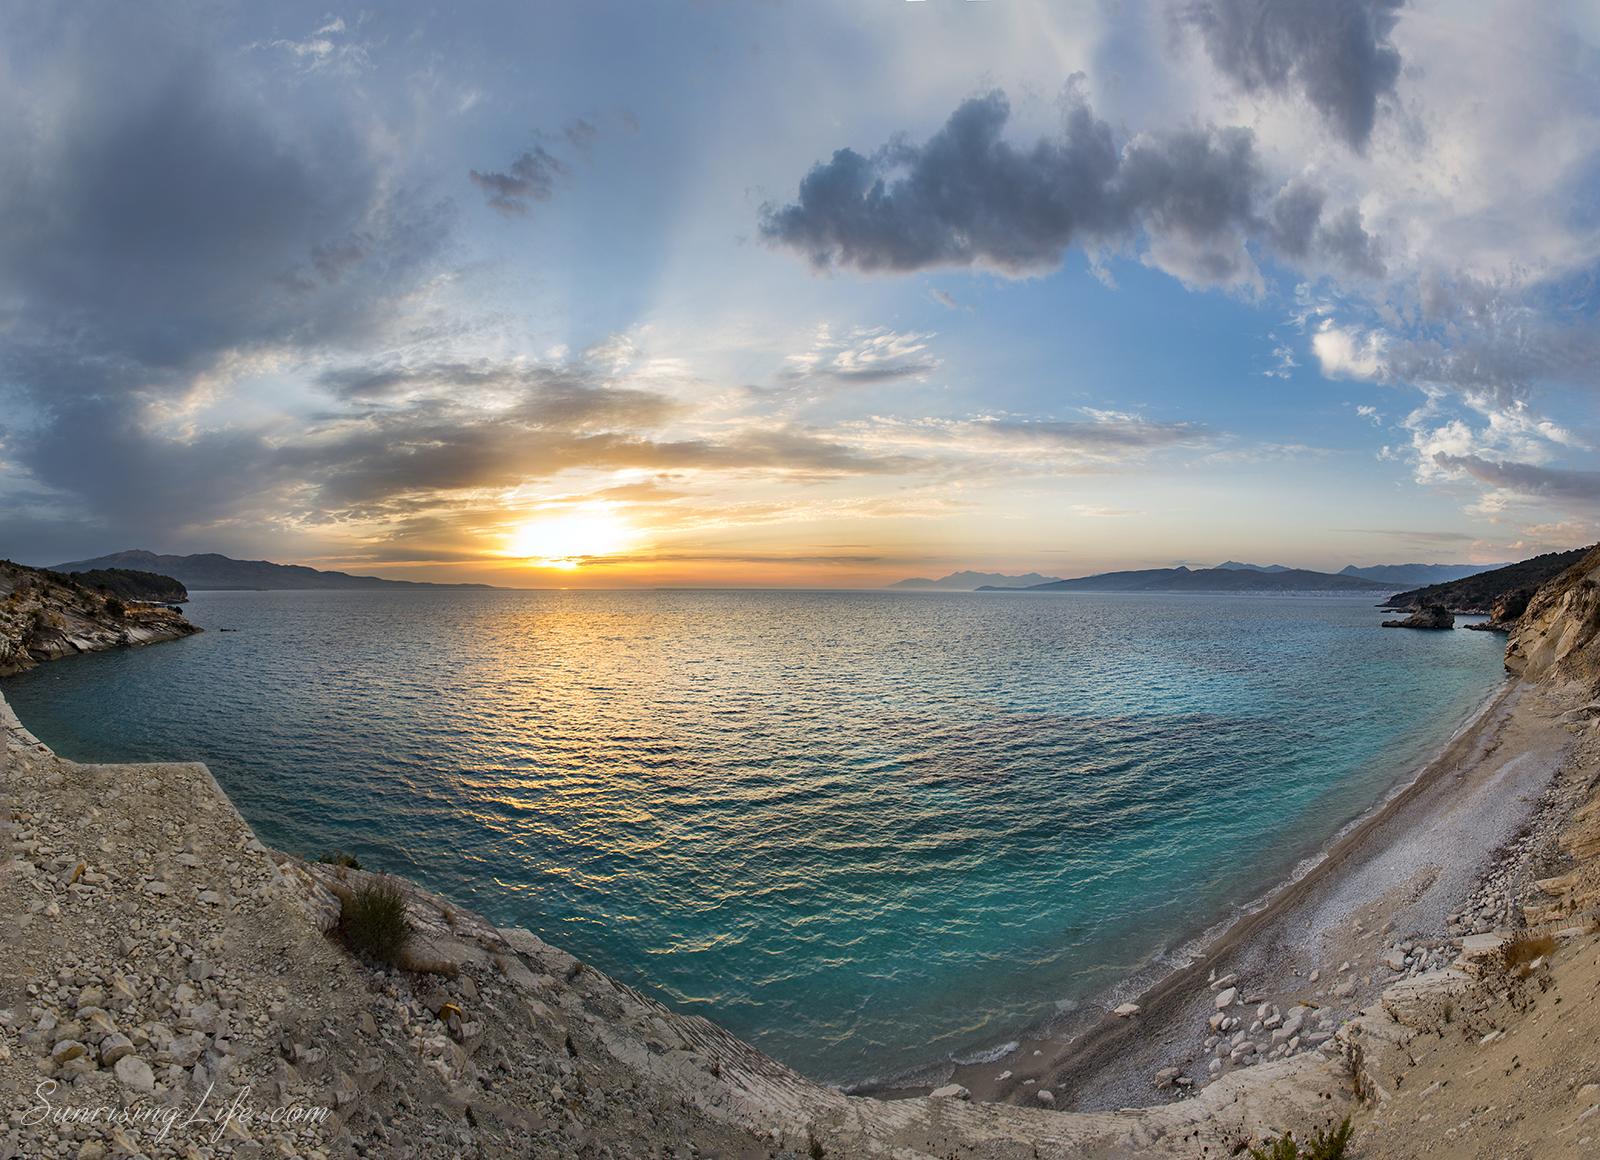 Sunset at Albanian coast